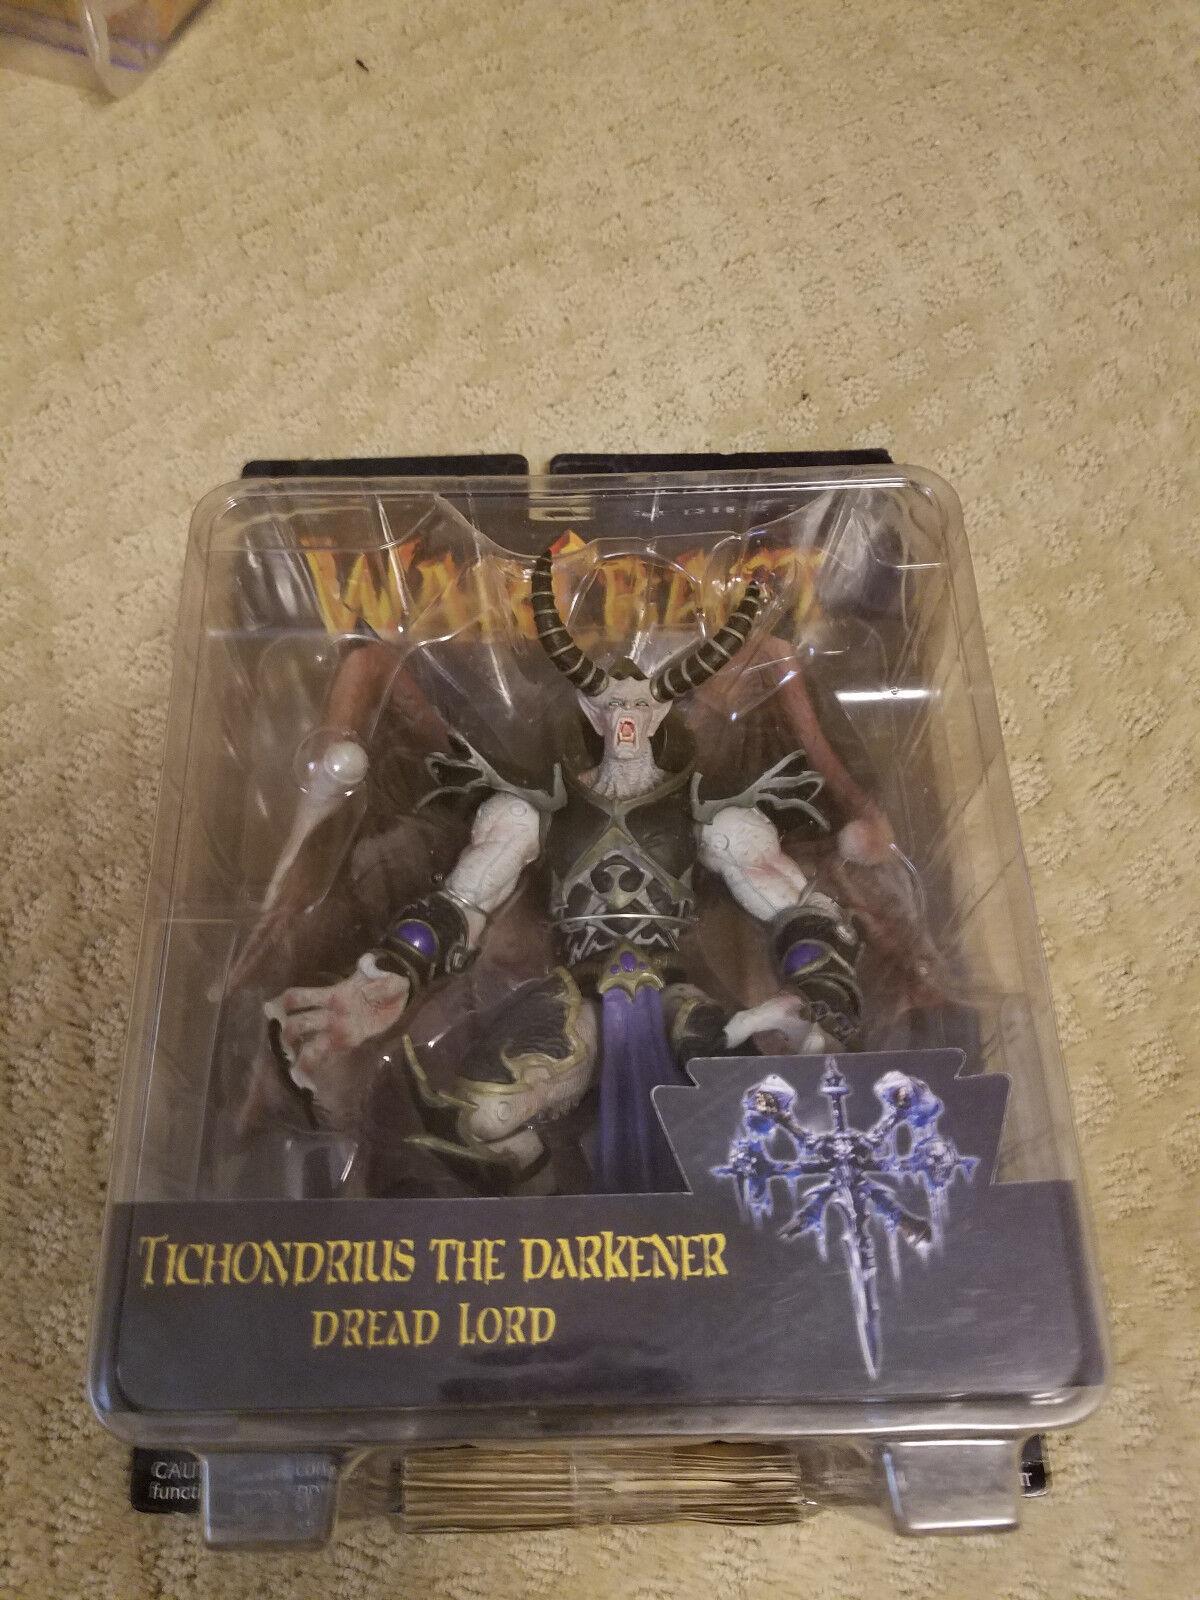 2003 Warcraft 3 Series 1 One Tichondrius the Darkener Dread Lord Figure MOC